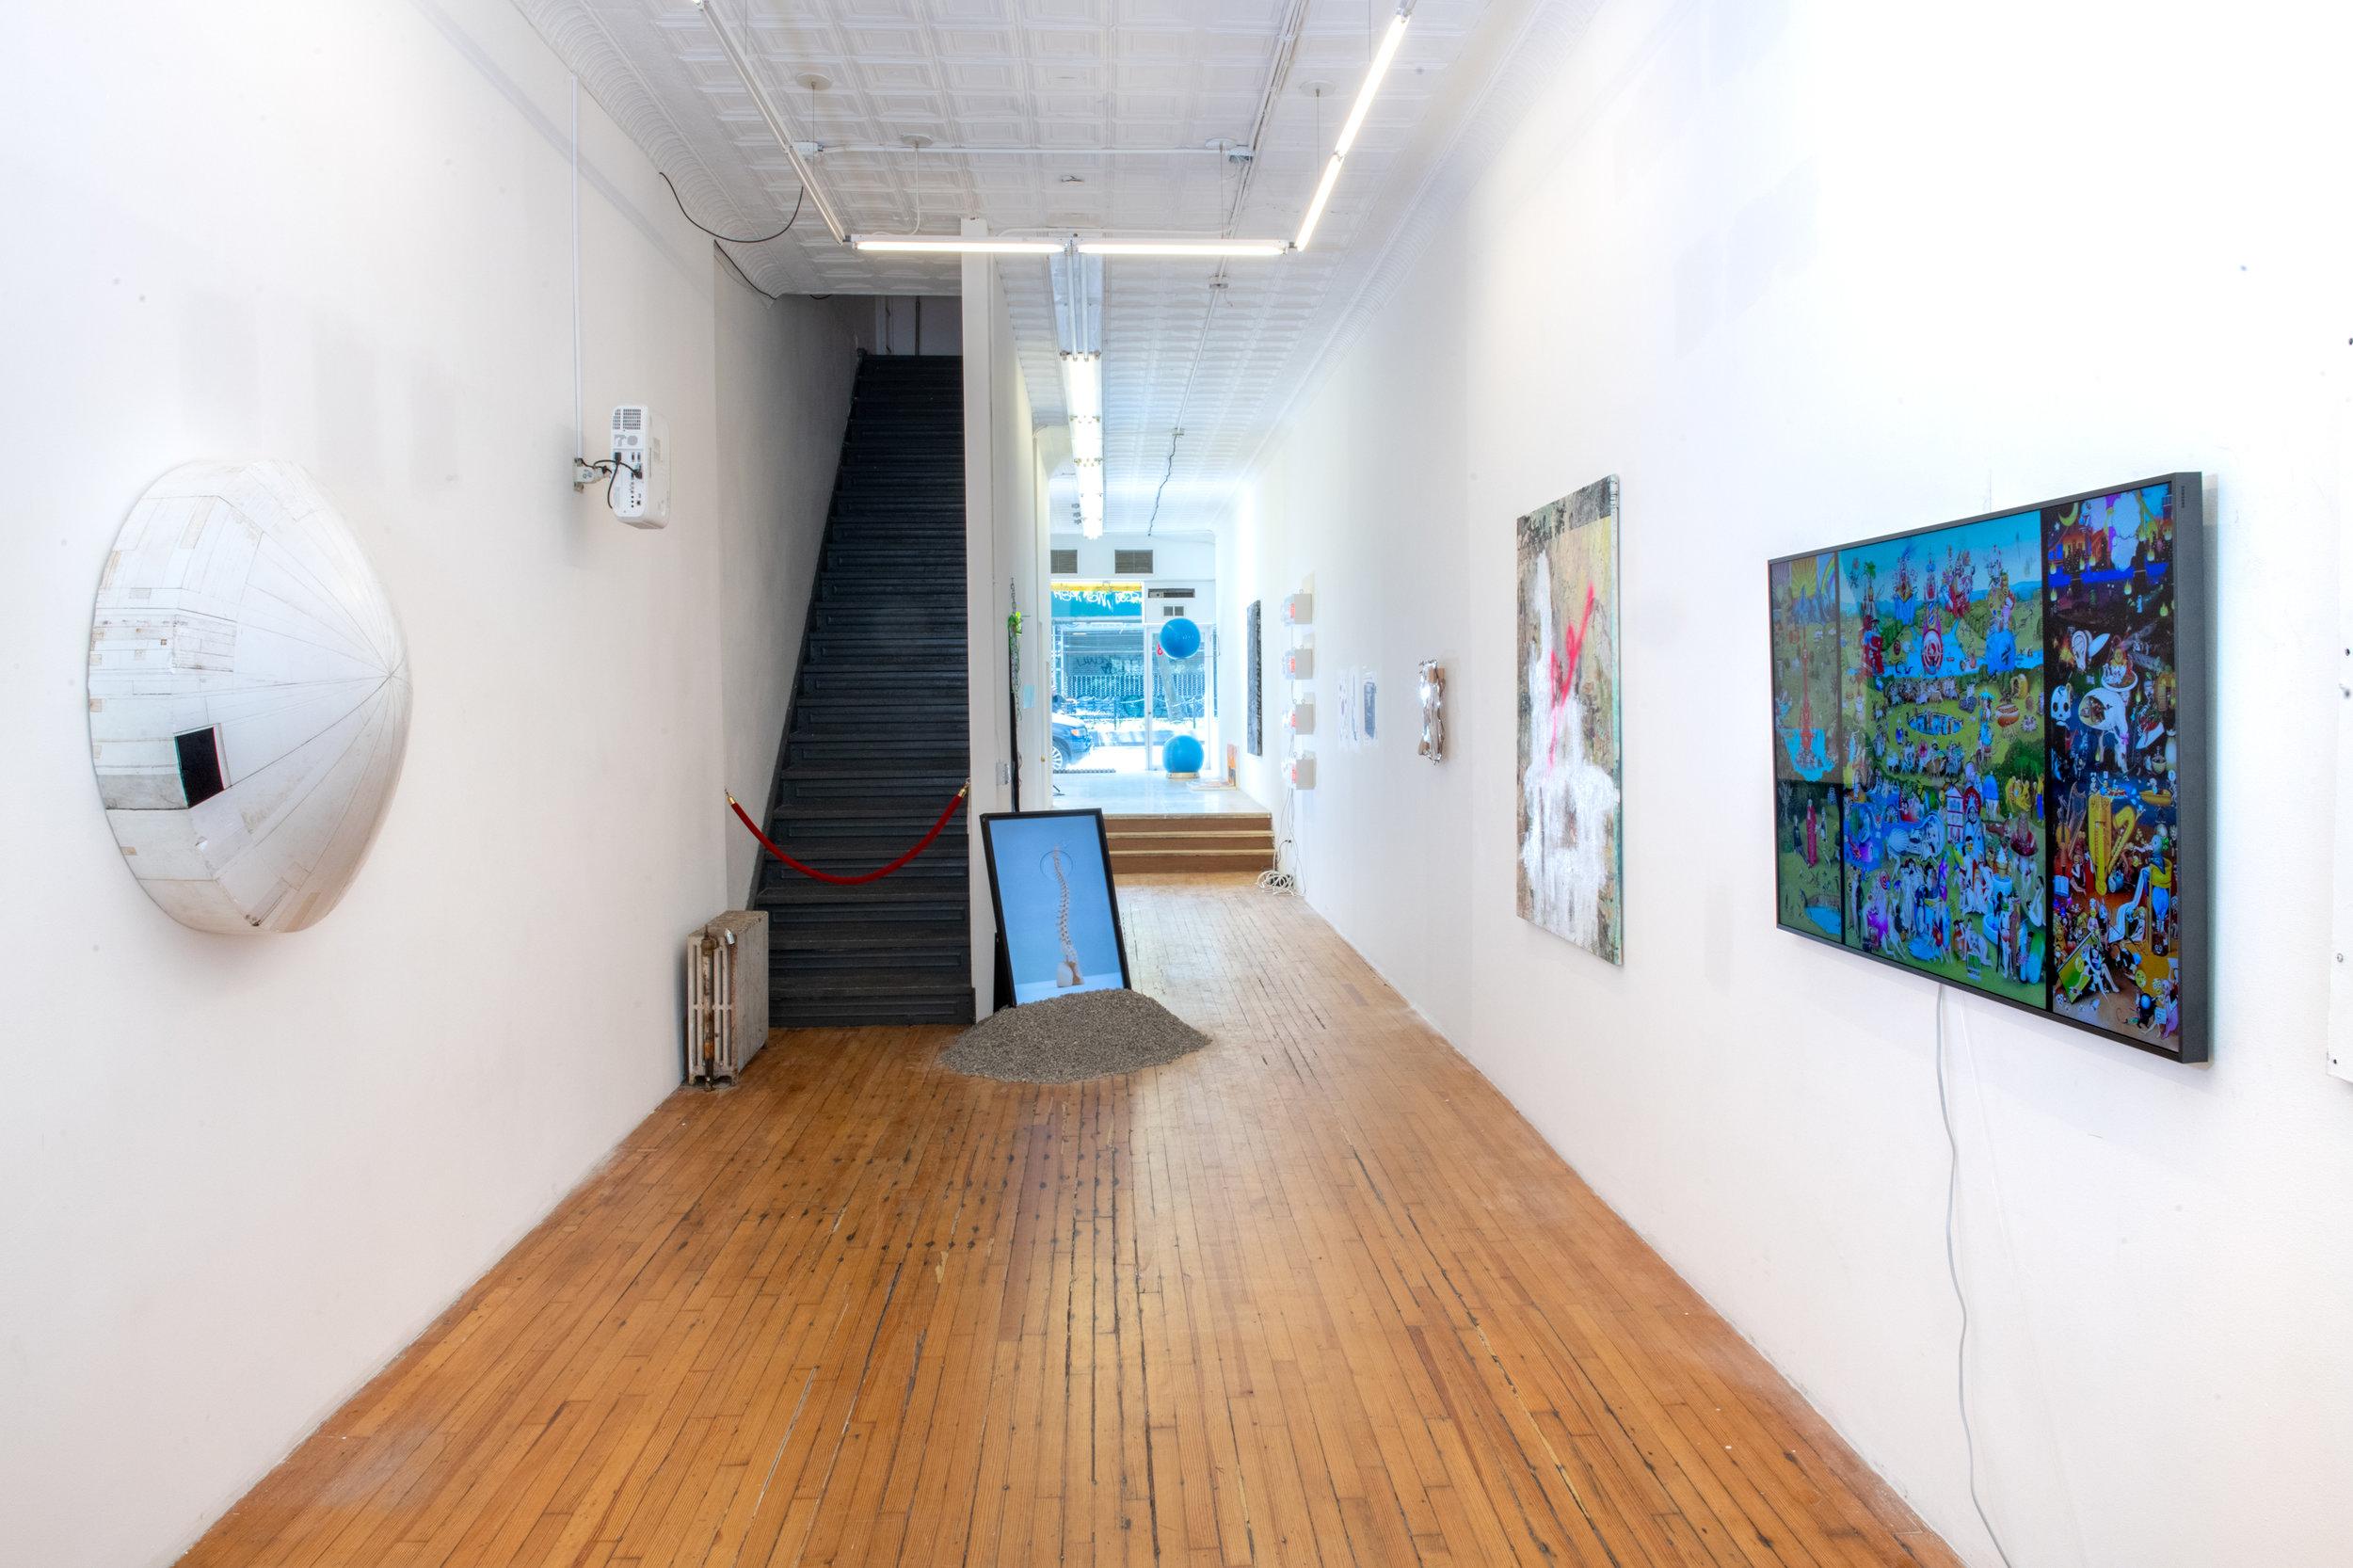 Here + Now Installation view at Pablo's Birthday Focus: Carla Gannis, Liz Naiden, Hiroyuki Hamada, Jenni Brosinski, and Stine Deja Photograph by - Edoardo Cozzani